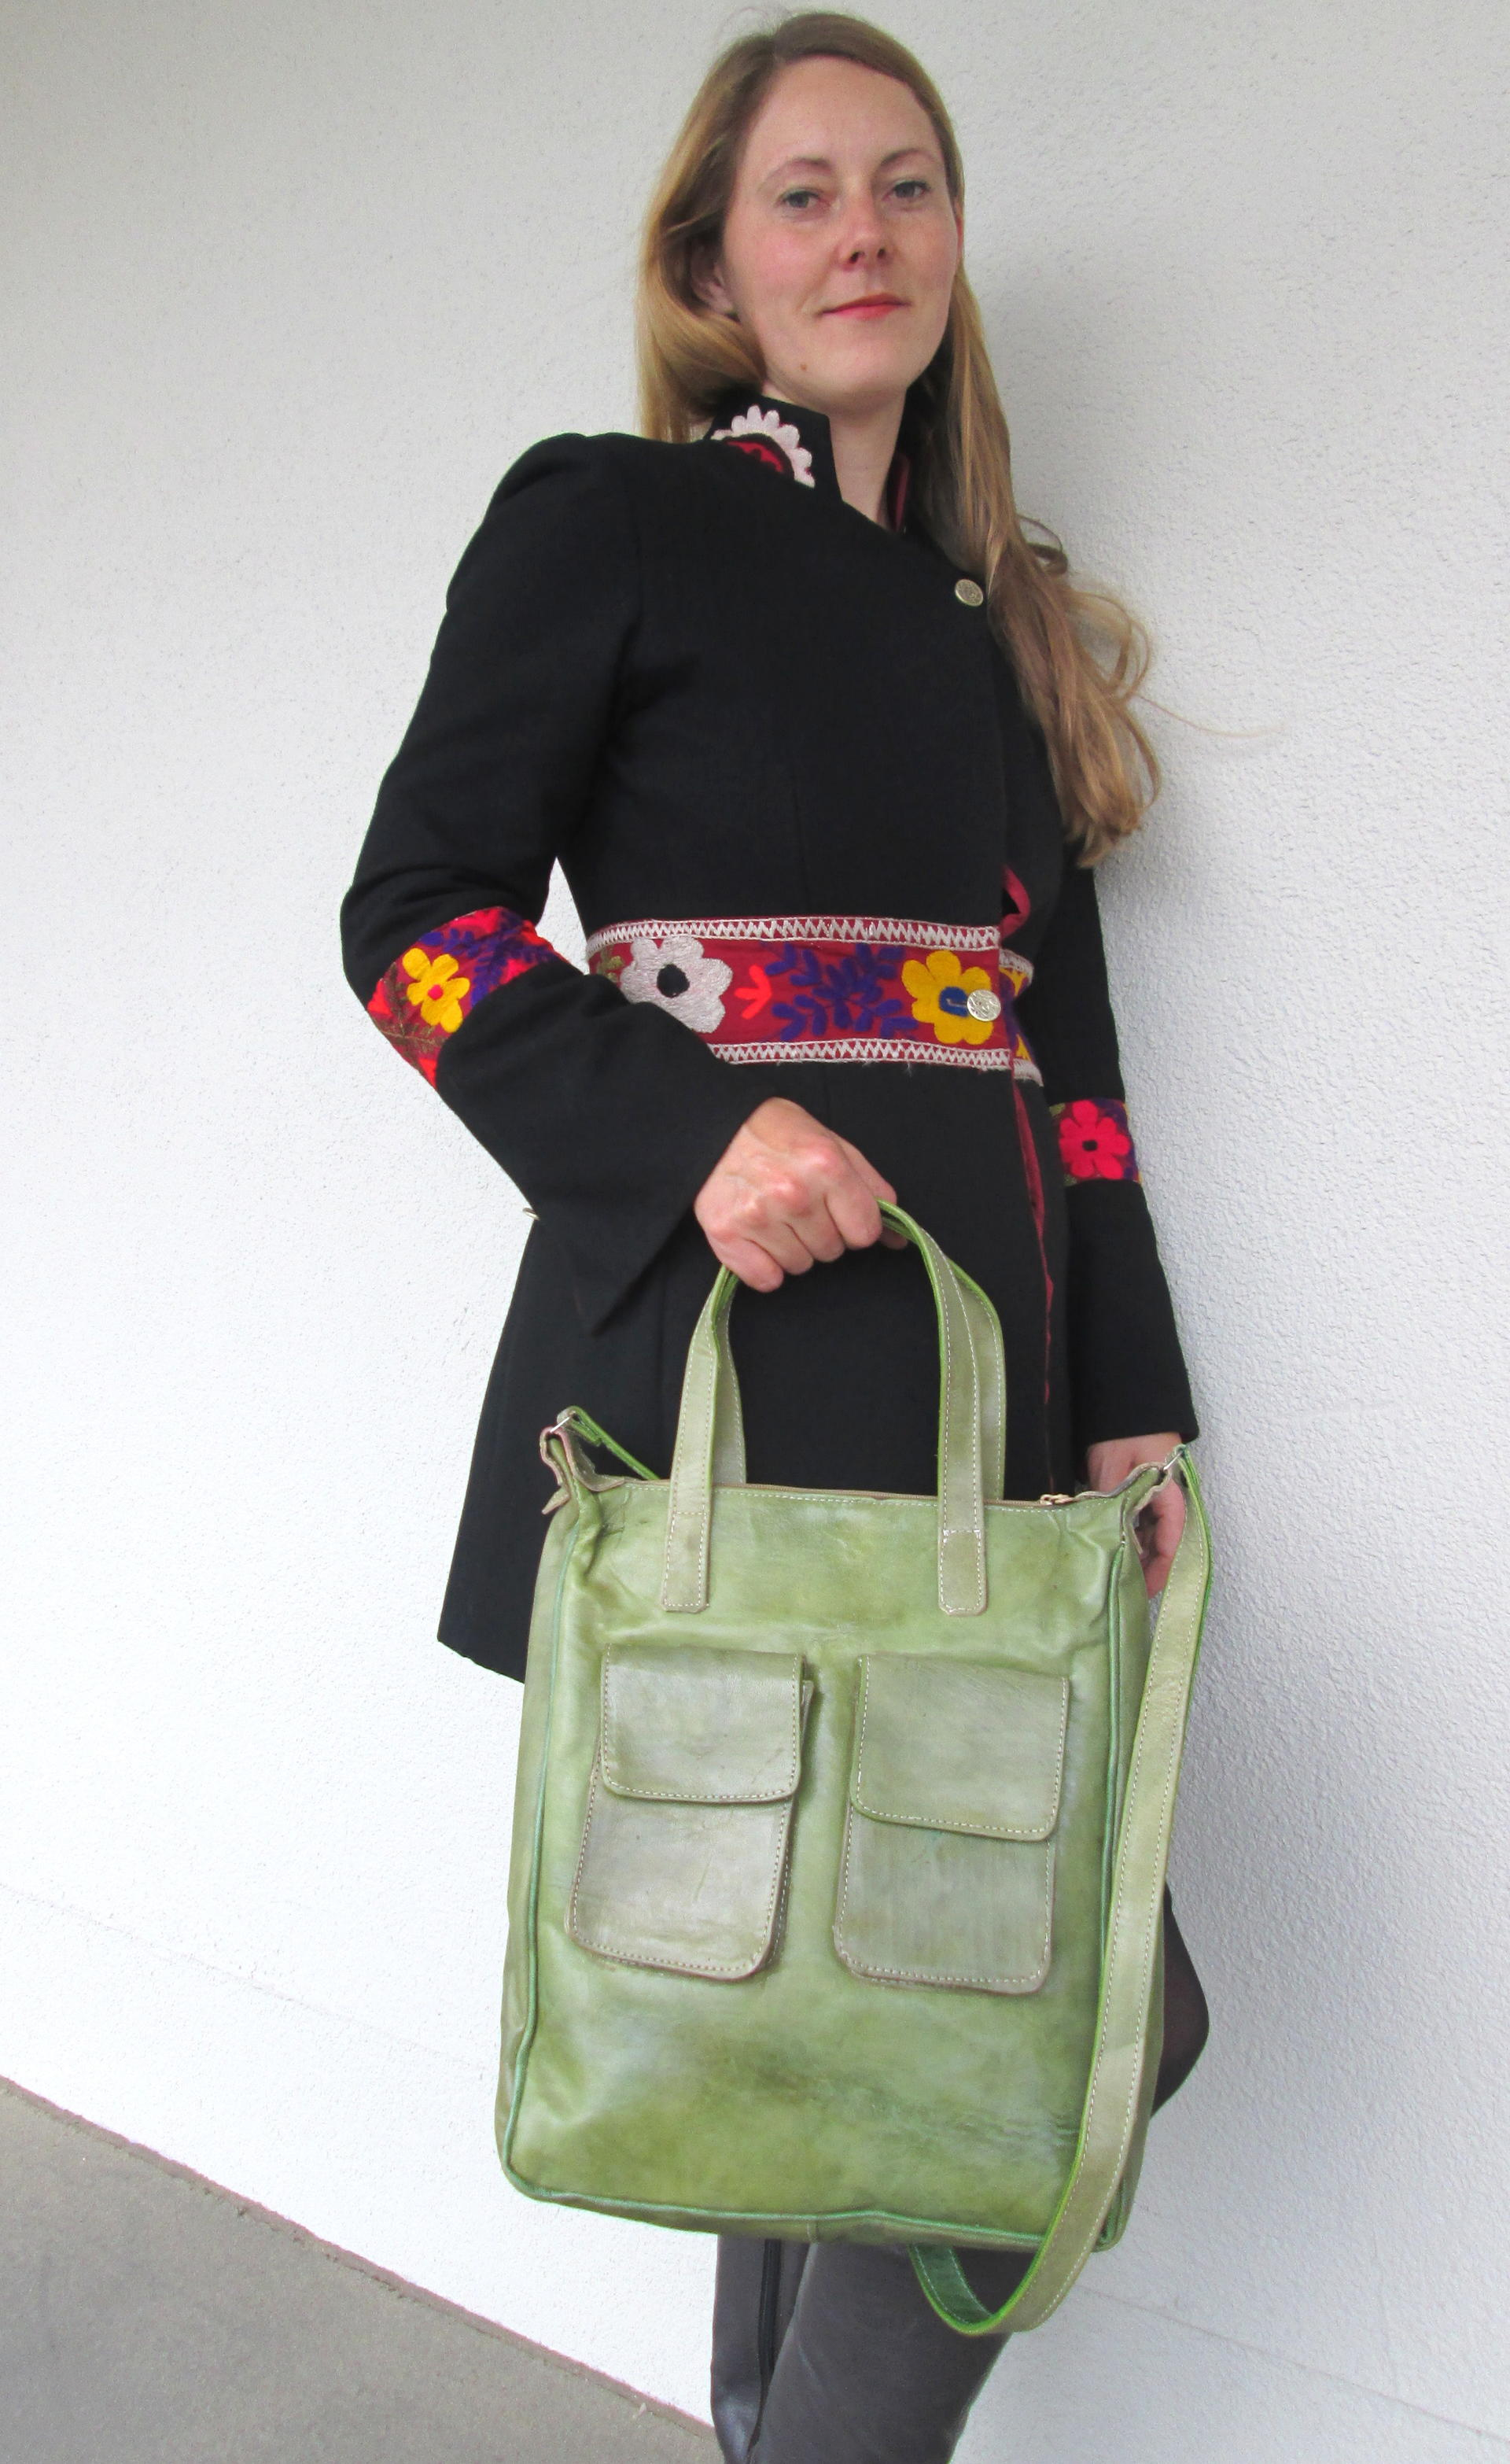 handbag in green leather - fair trade from Burkina Faso